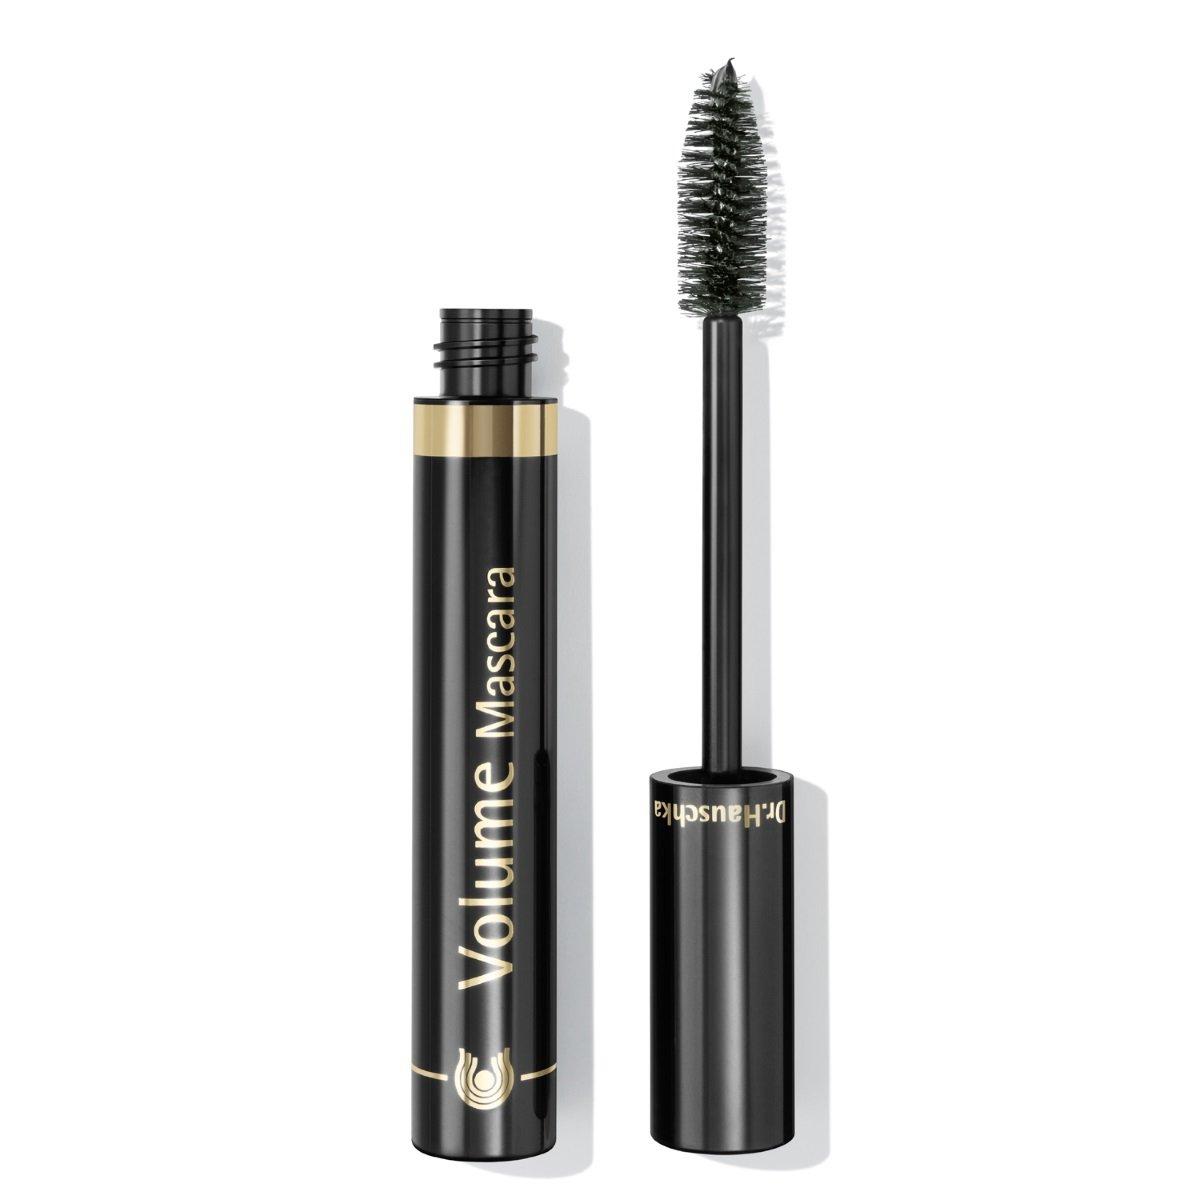 05f603ce888 Amazon.com : Pearl Anthracite Volume Mascara mascara by Dr. Hauschka Skin  Care : Beauty